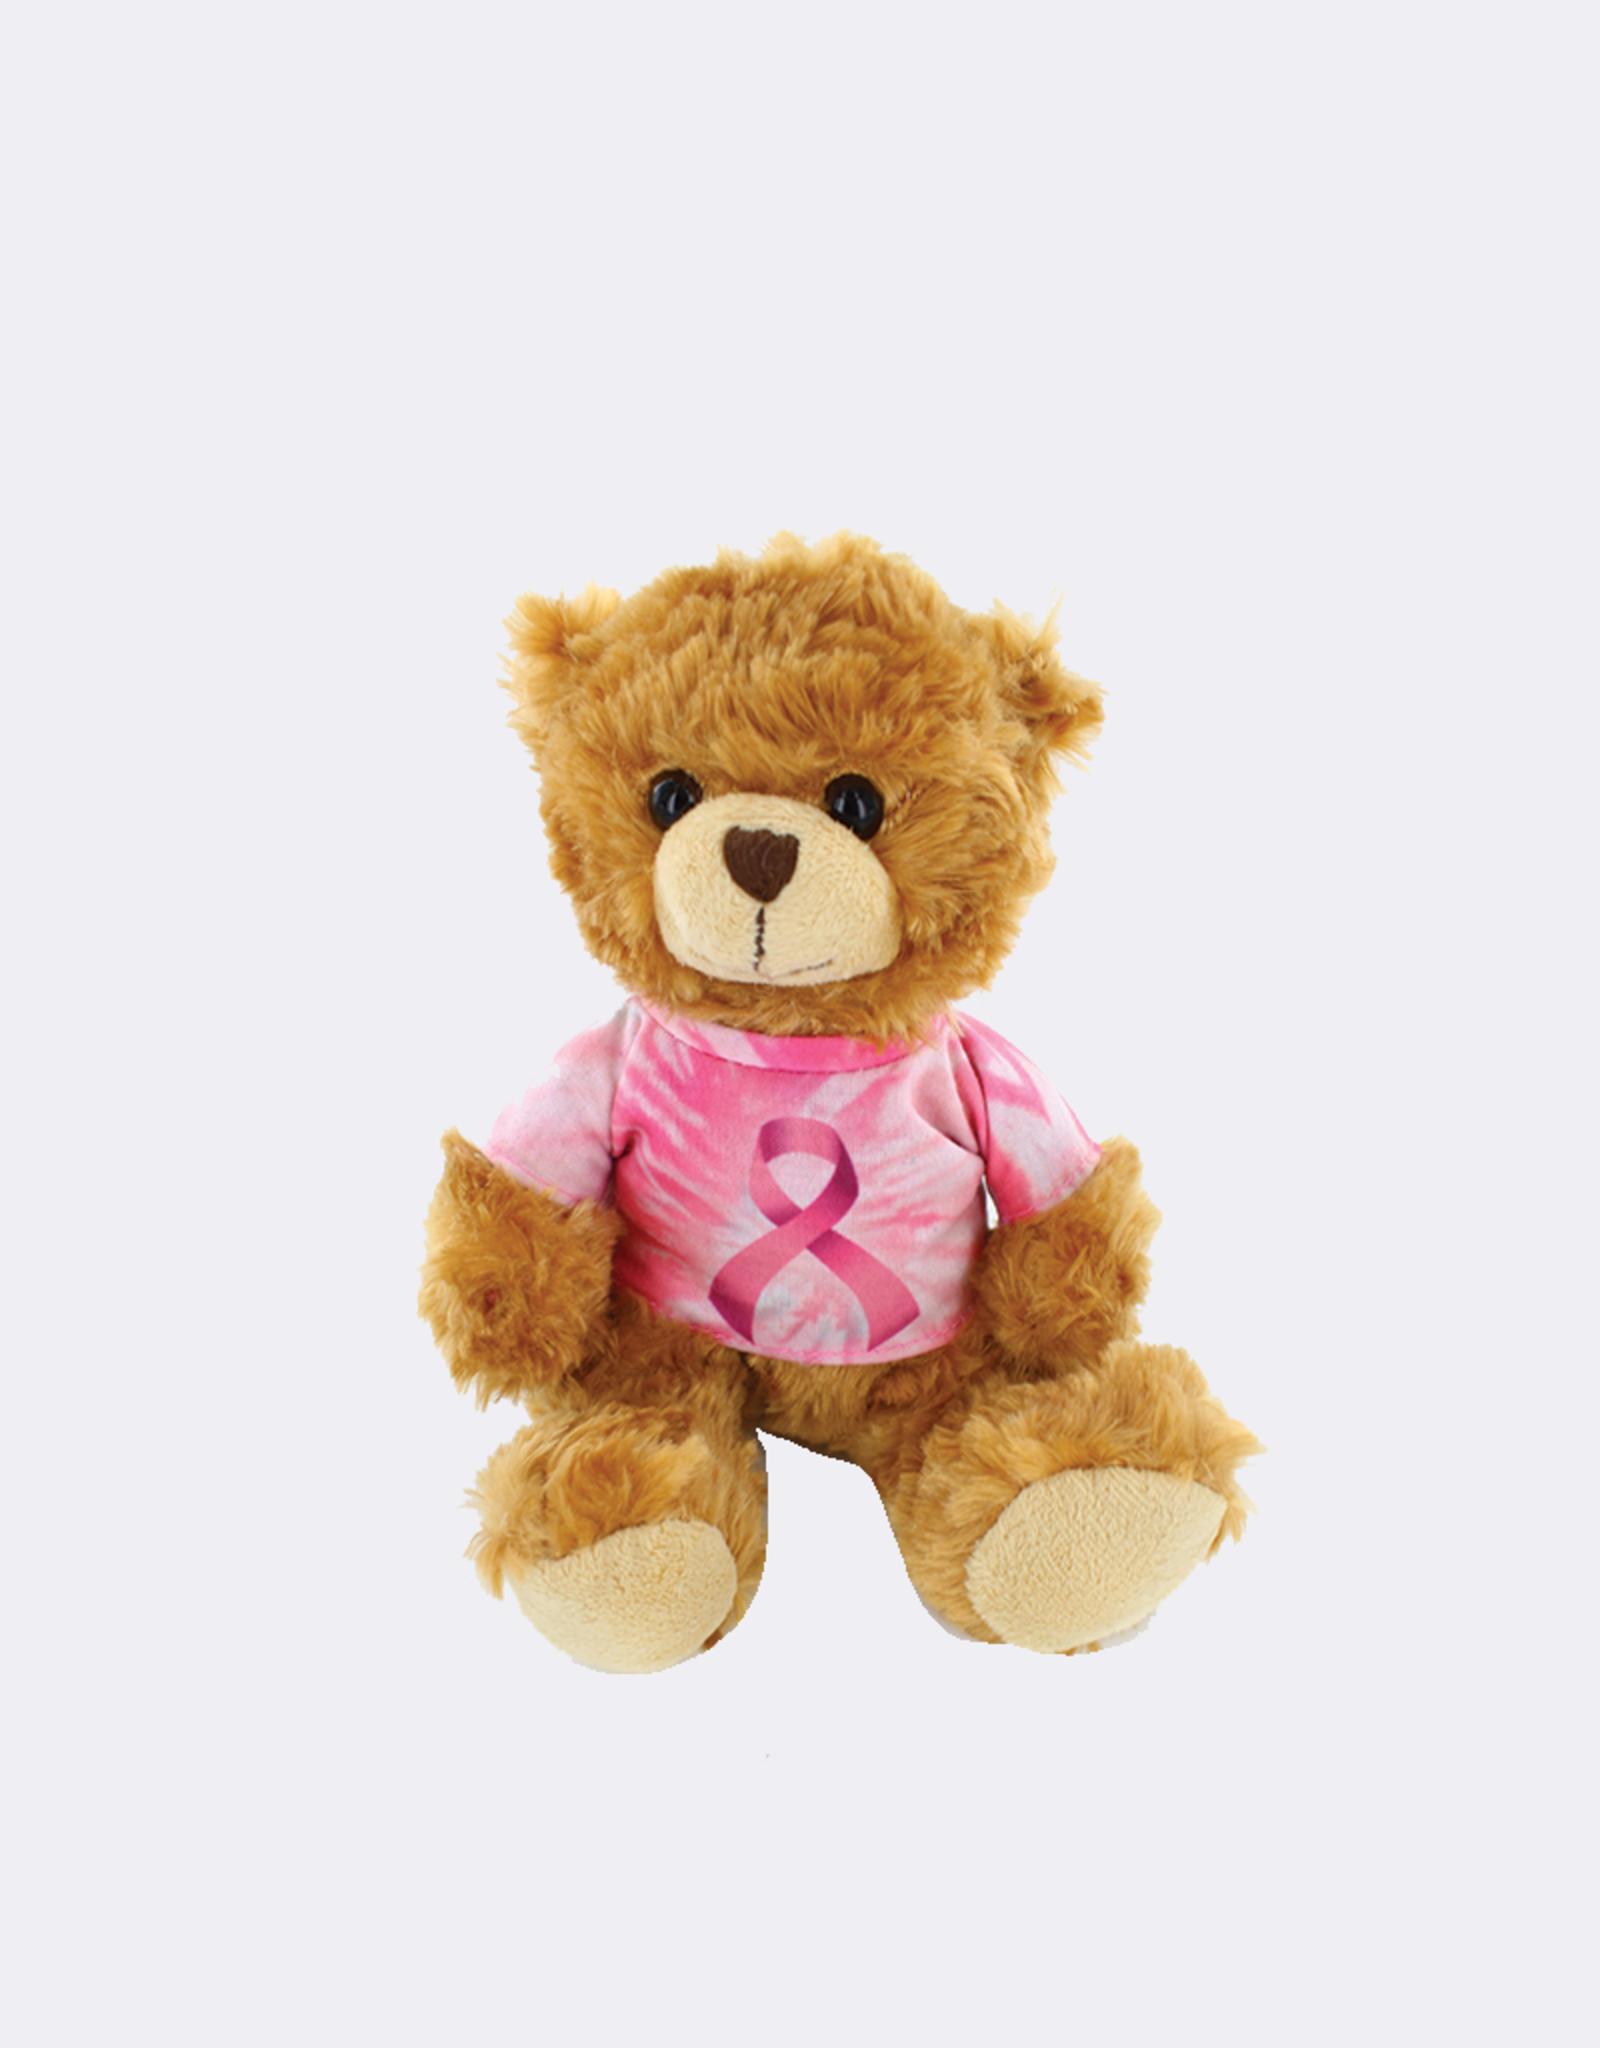 Cancer Awareness Tie Dye Bear